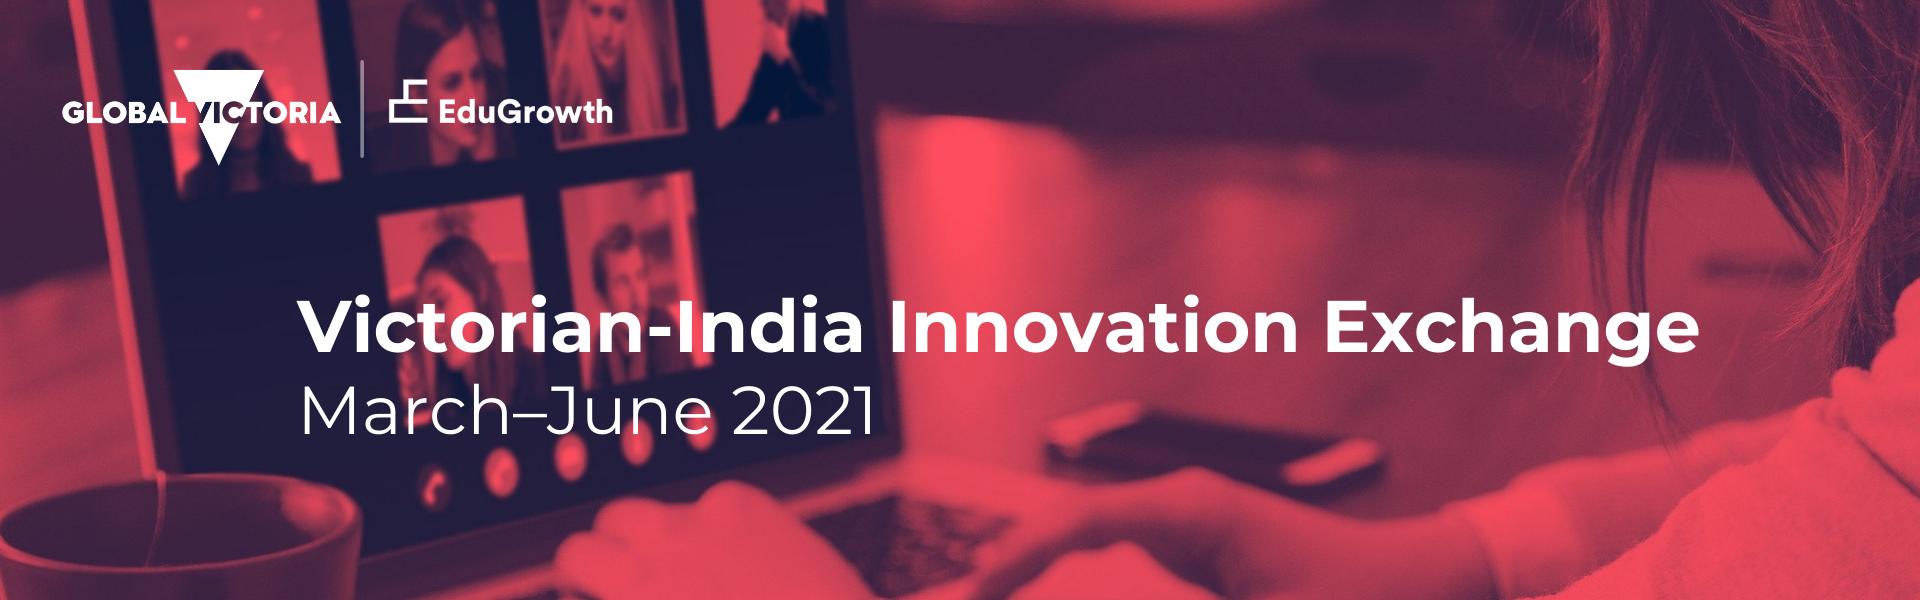 EduGrowth Victorian India Innovation Exchange - Pink Banner